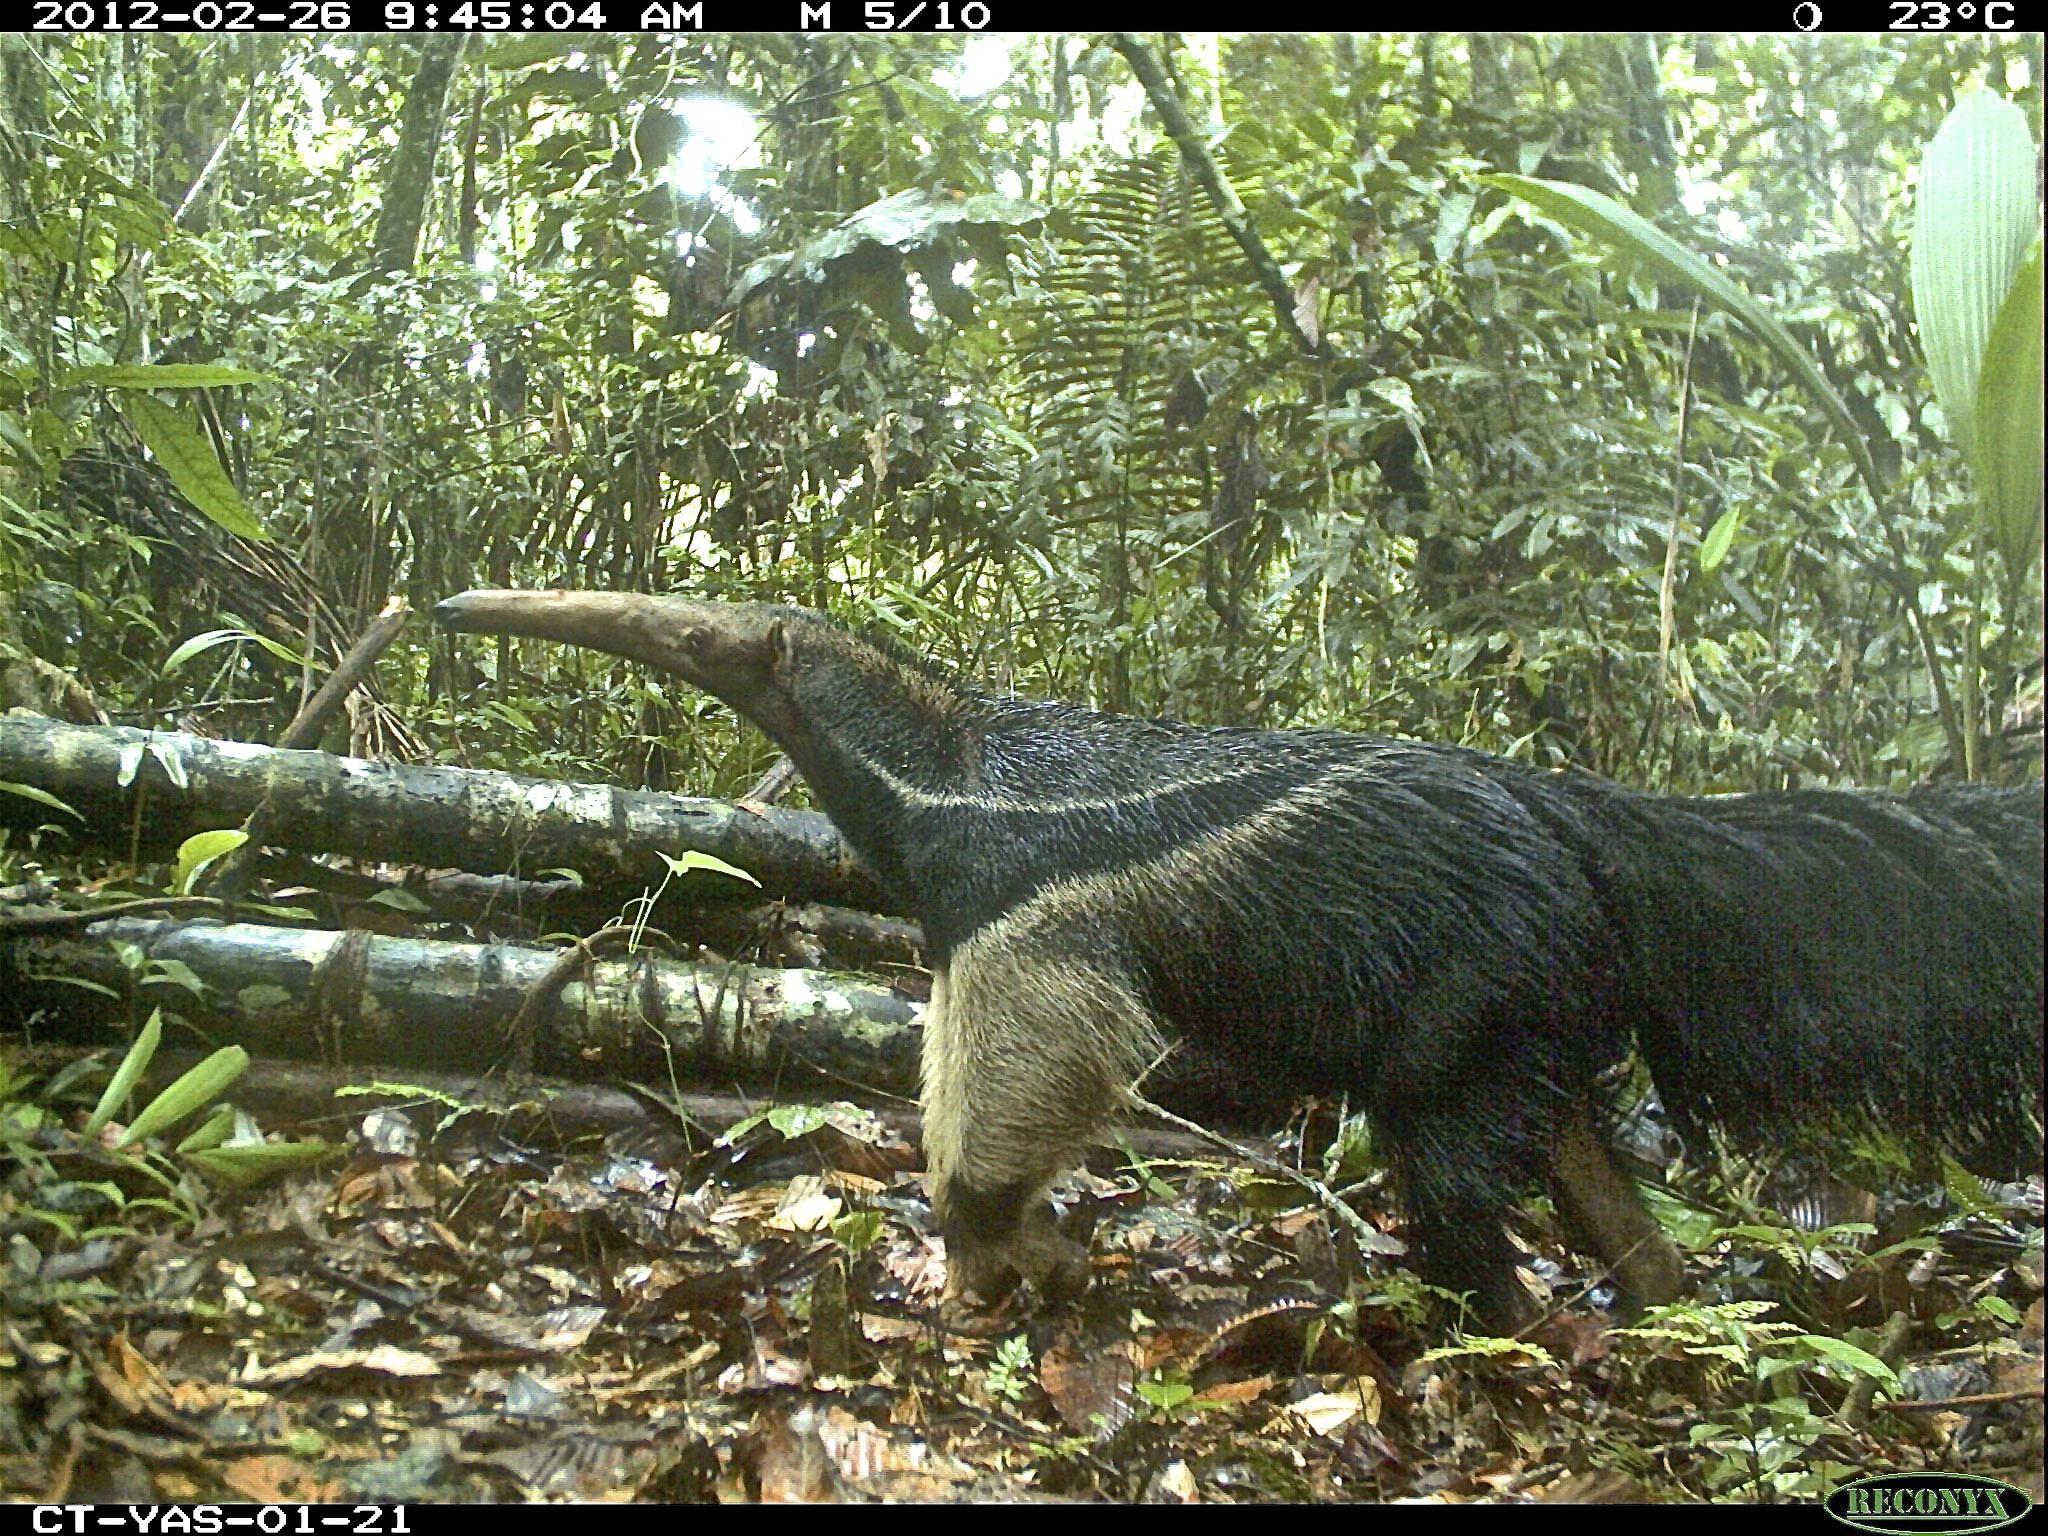 A giant anteater (Myrmecophaga tridactyla) in Yasuní National Park, Ecuador. Image credit:  Julia Salvador, TEAM Network and Missouri Botanical Garden